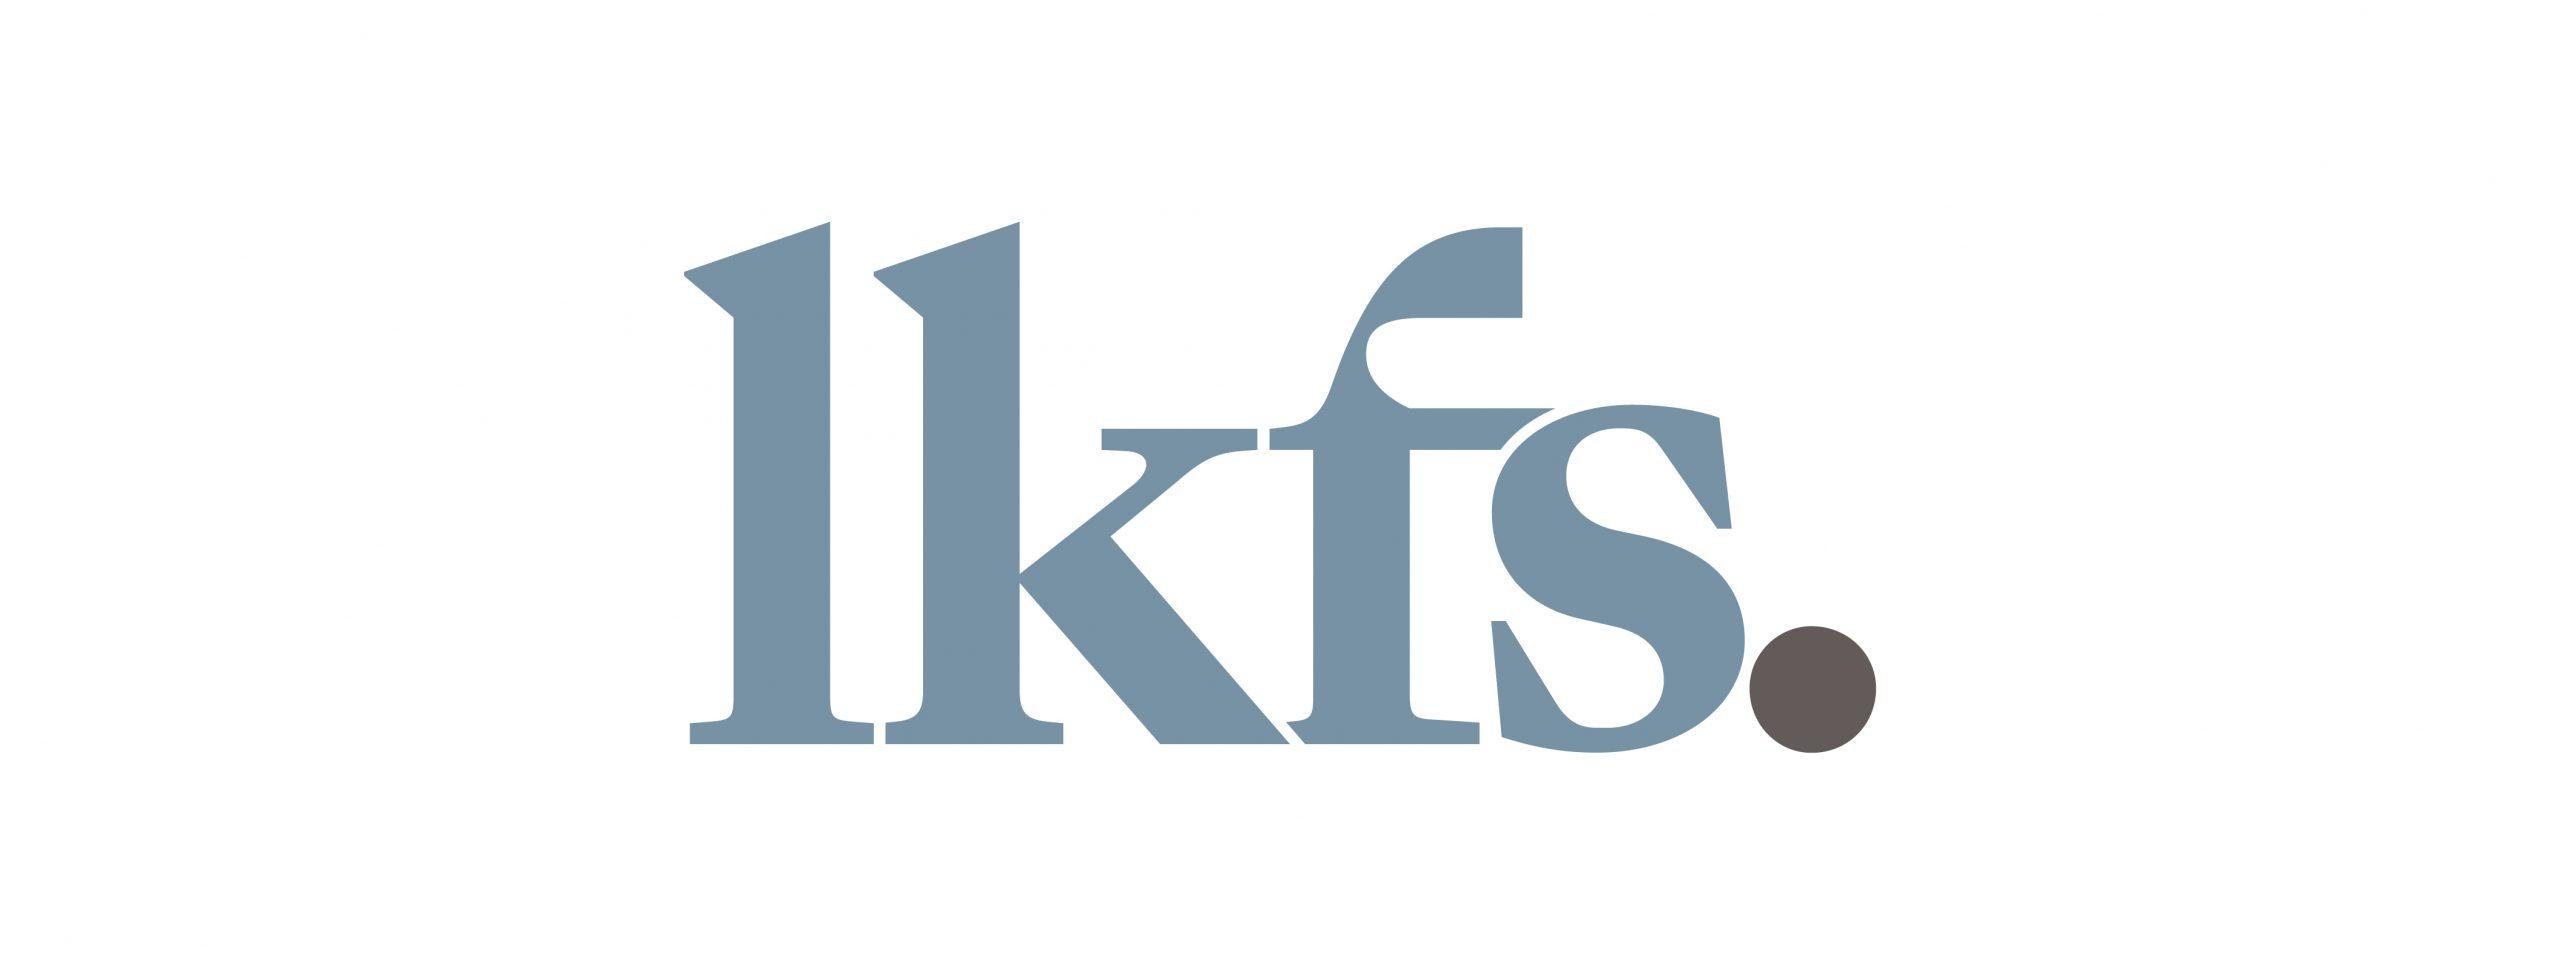 LFKS-Financial